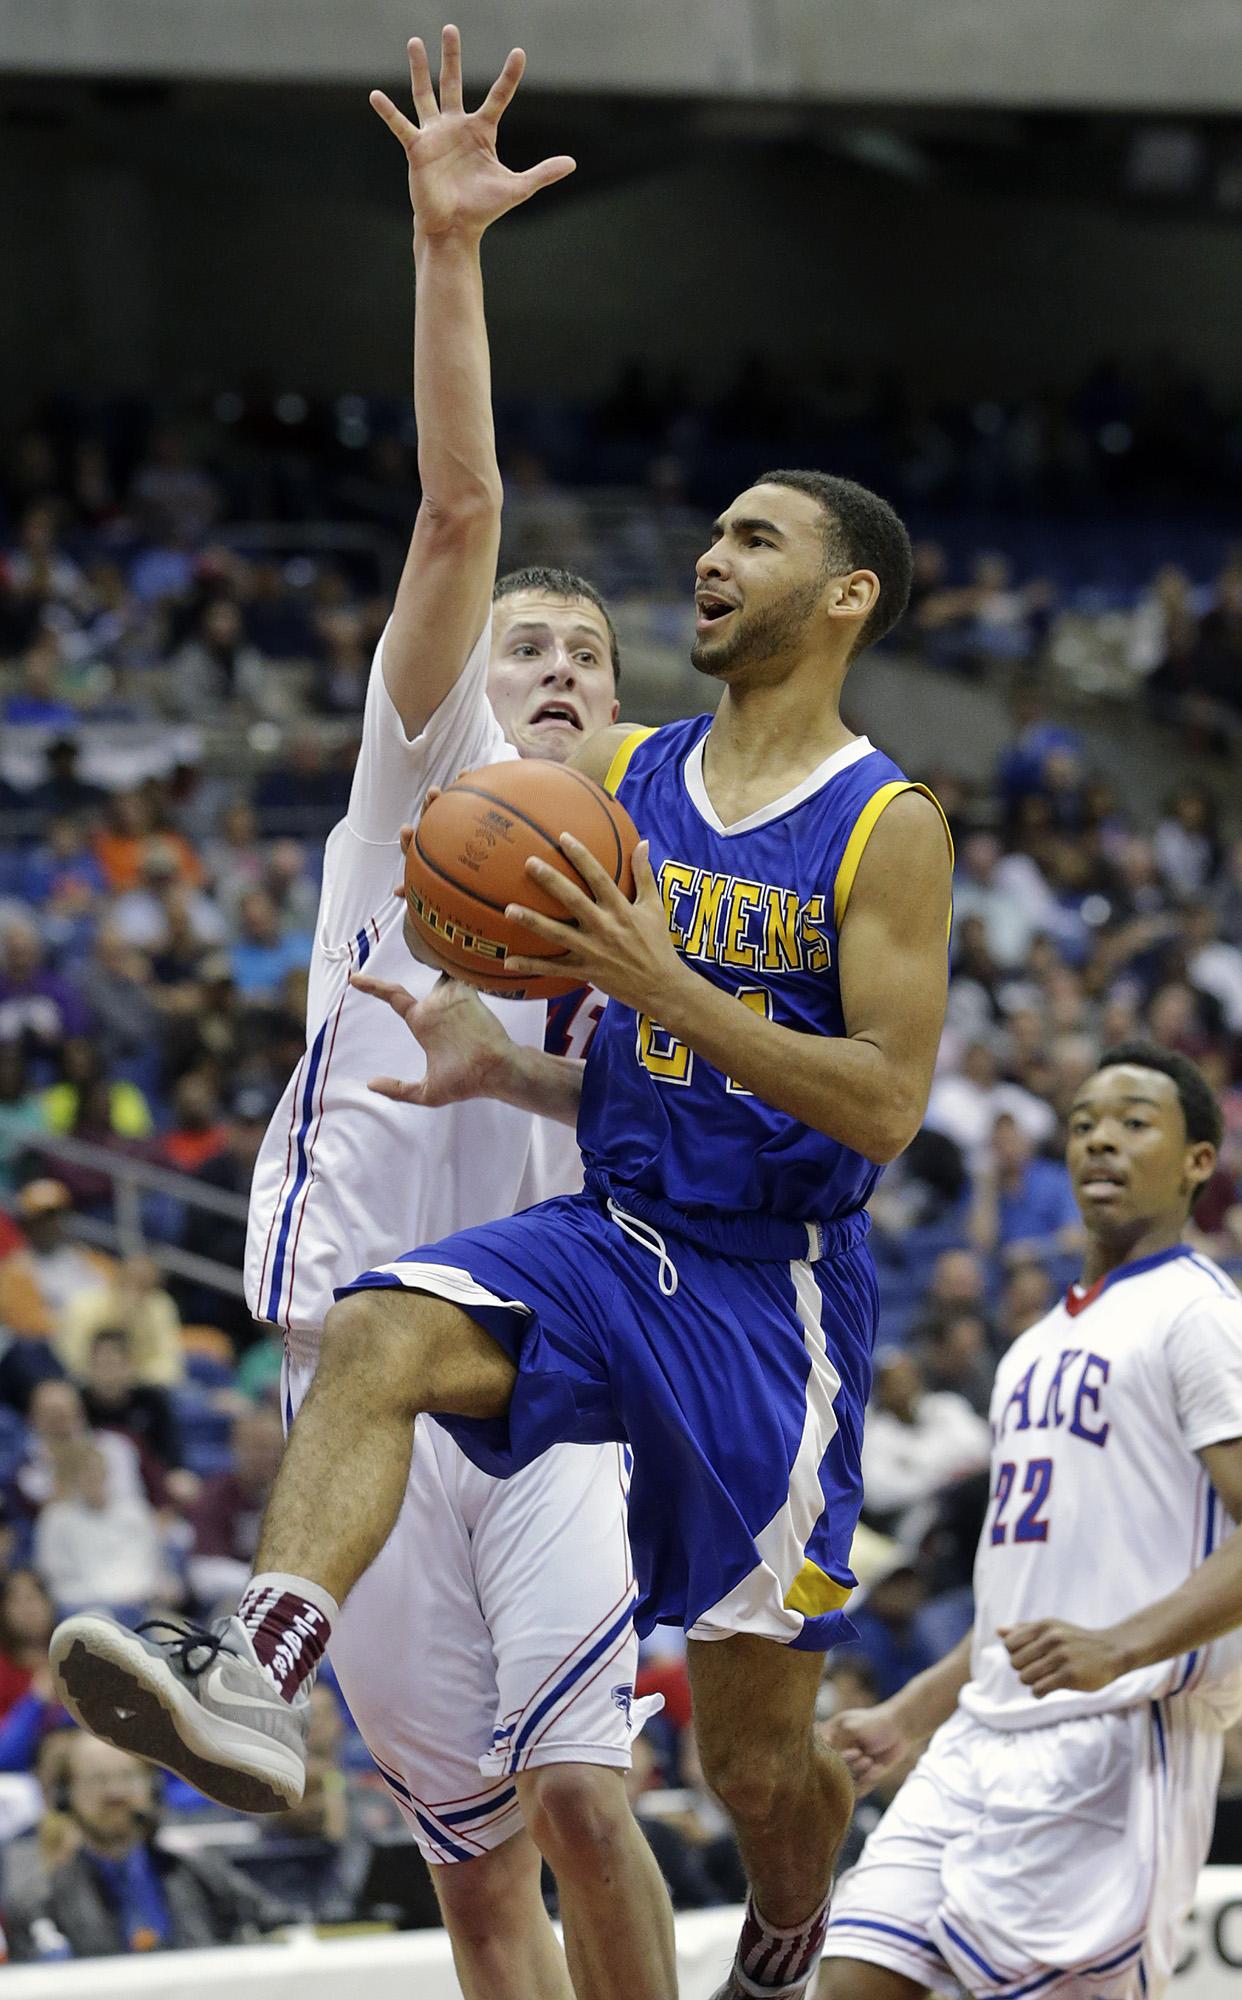 2015 16 Area Boys Basketball All District Teams San Antonio Palomino Xaveri Totebag Grey Express News